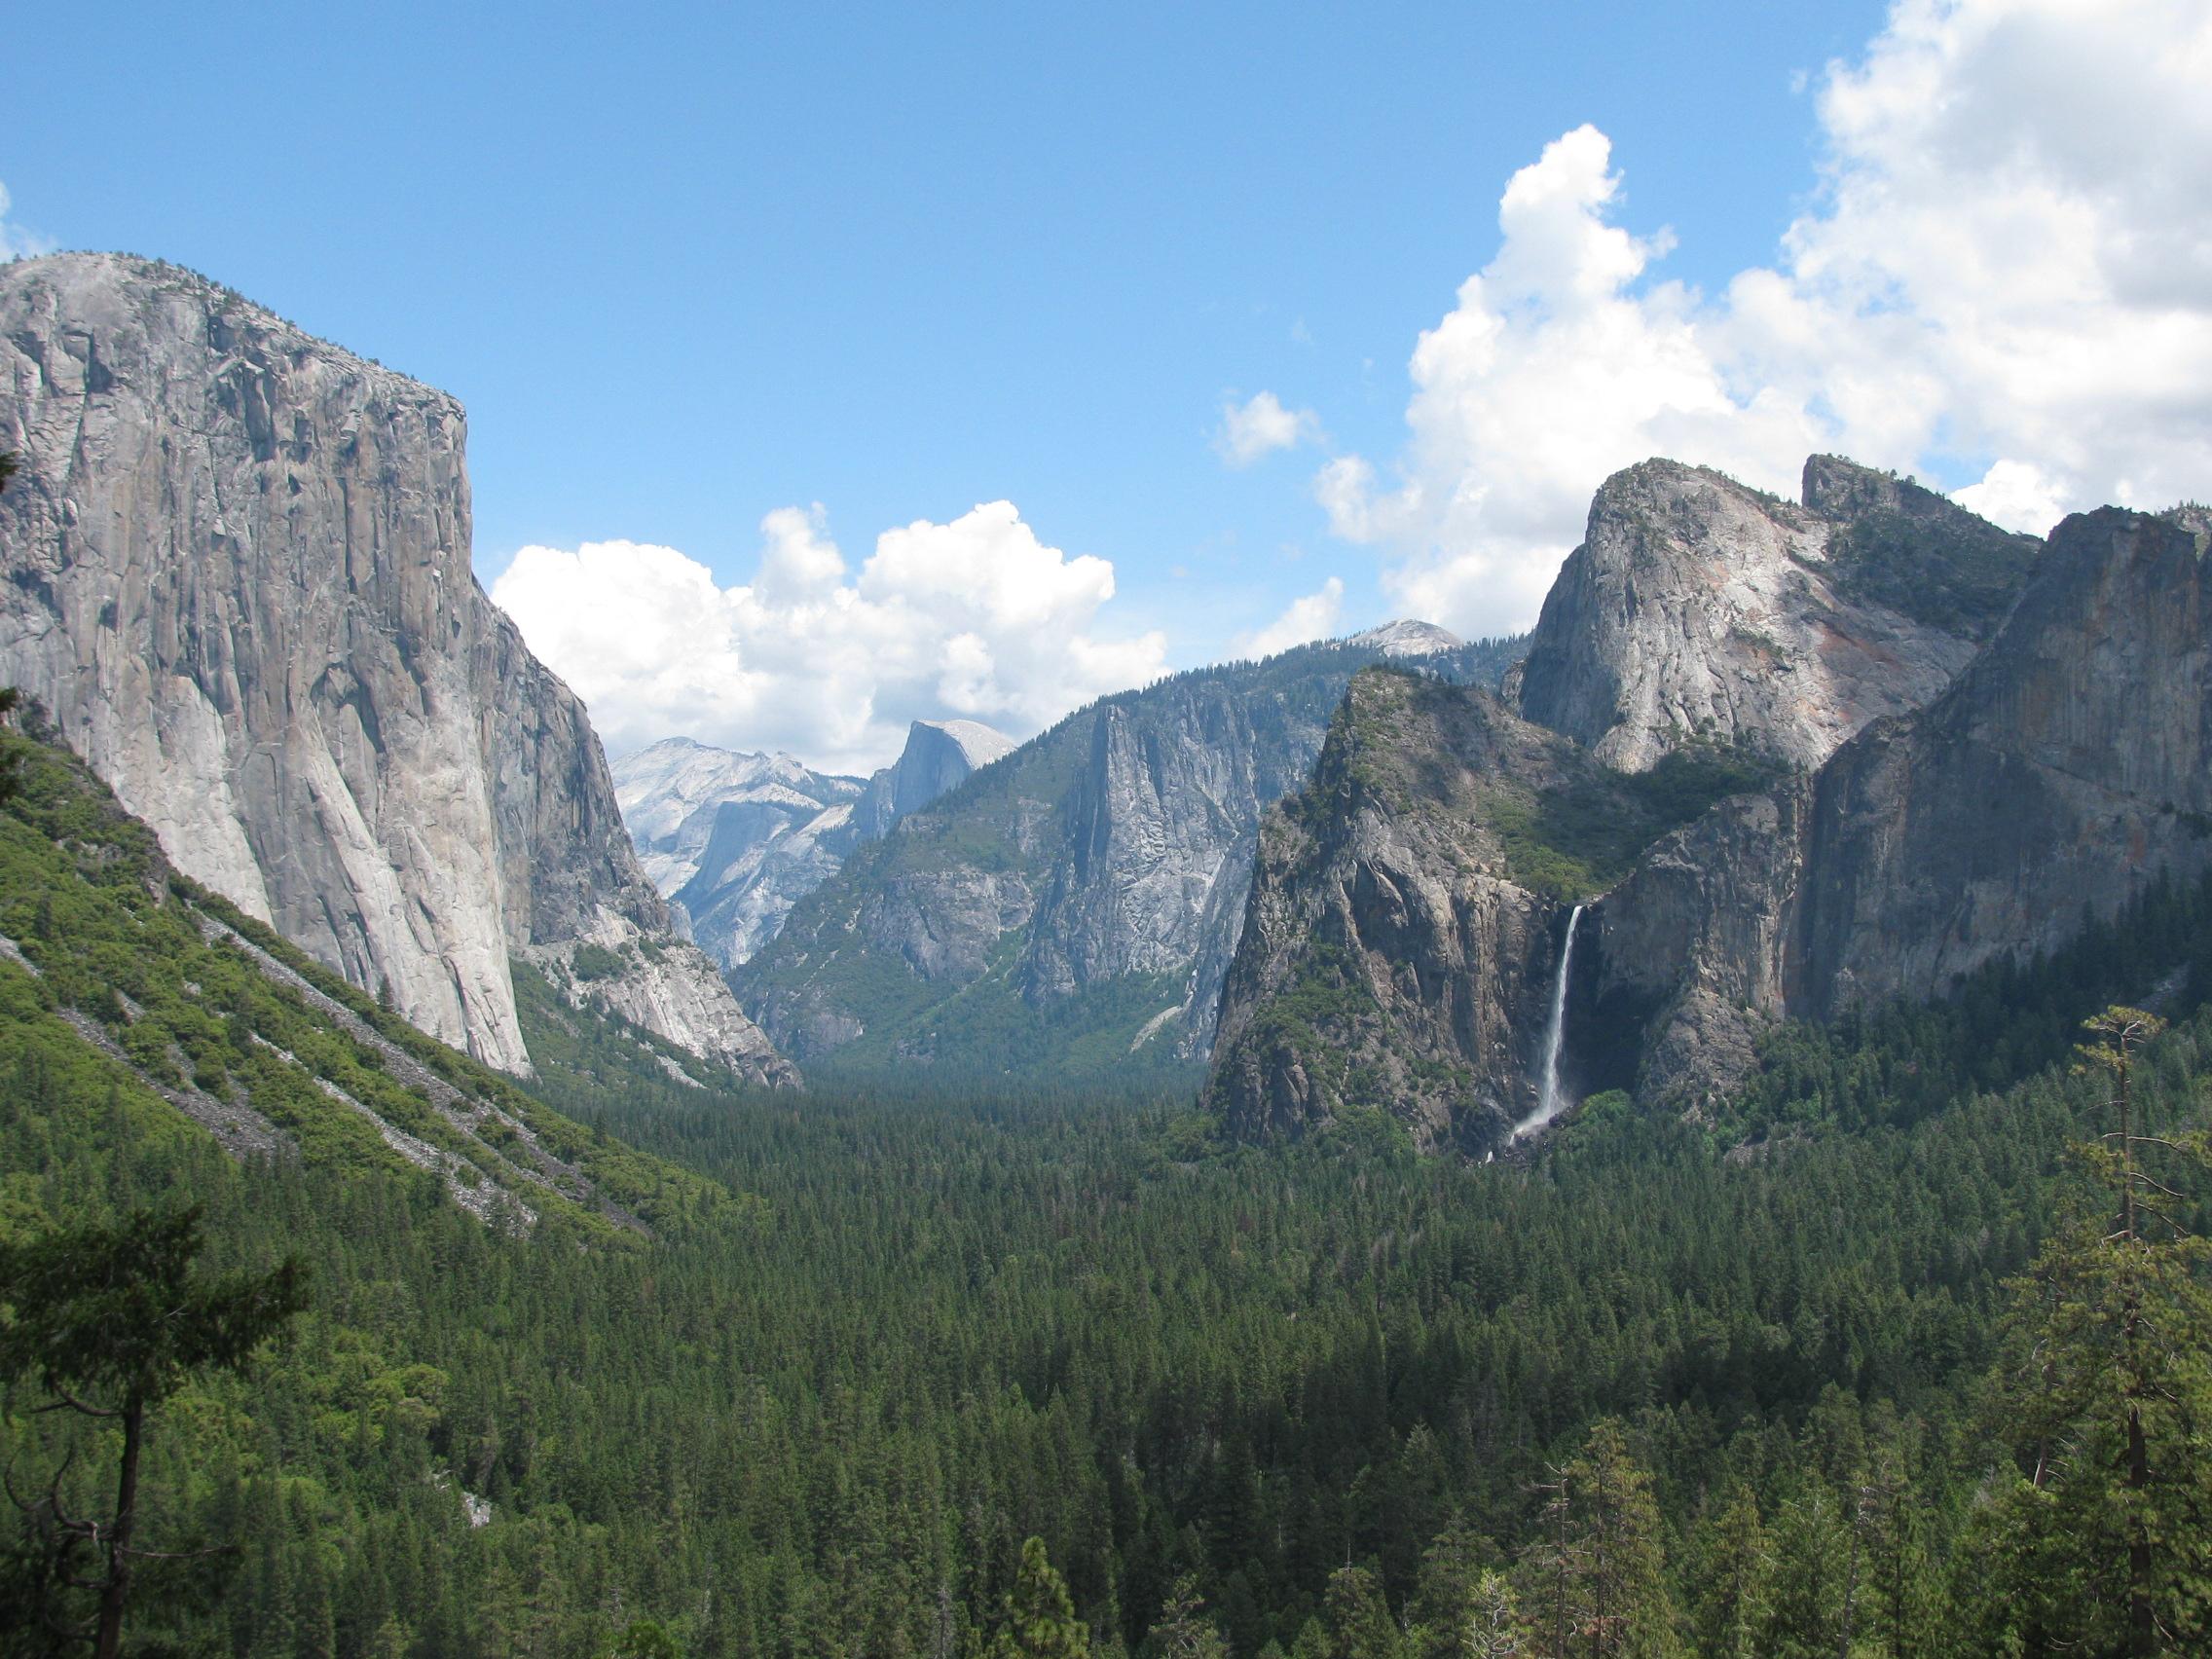 Yosemite view with El Capitan